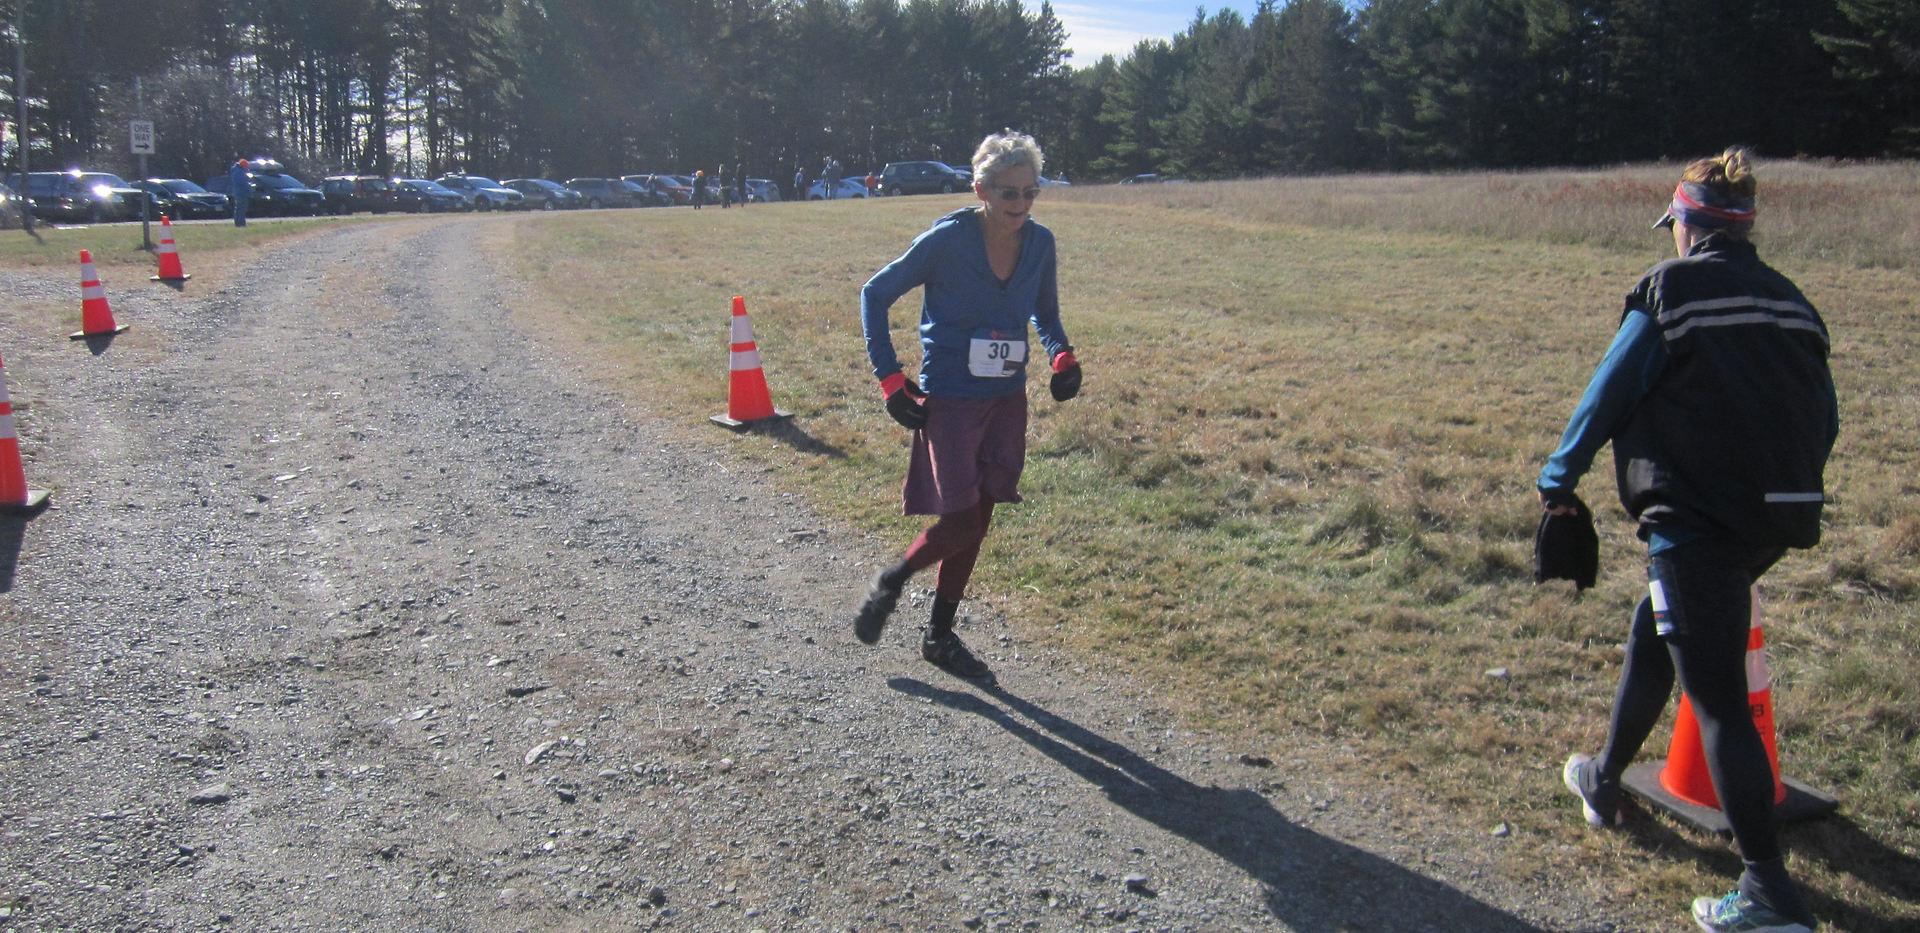 SunriseAC member - Donna, finishes 13.1 miles!